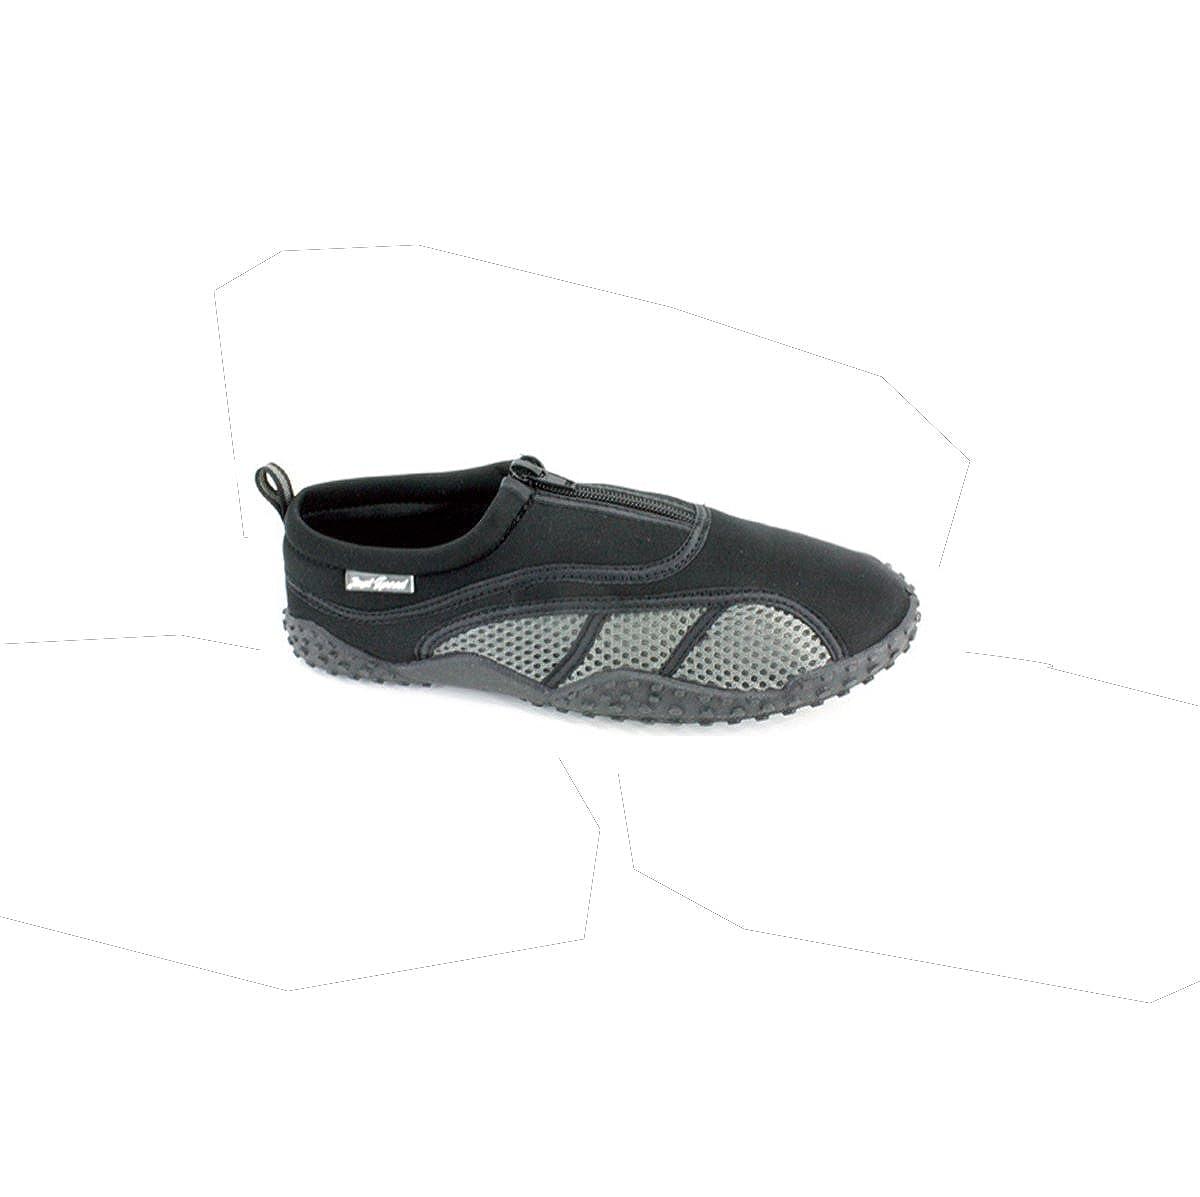 Mens Just Speed Big Size Large Size Plus Size Neoprene Zipper Mesh Water//Aqua Shoes